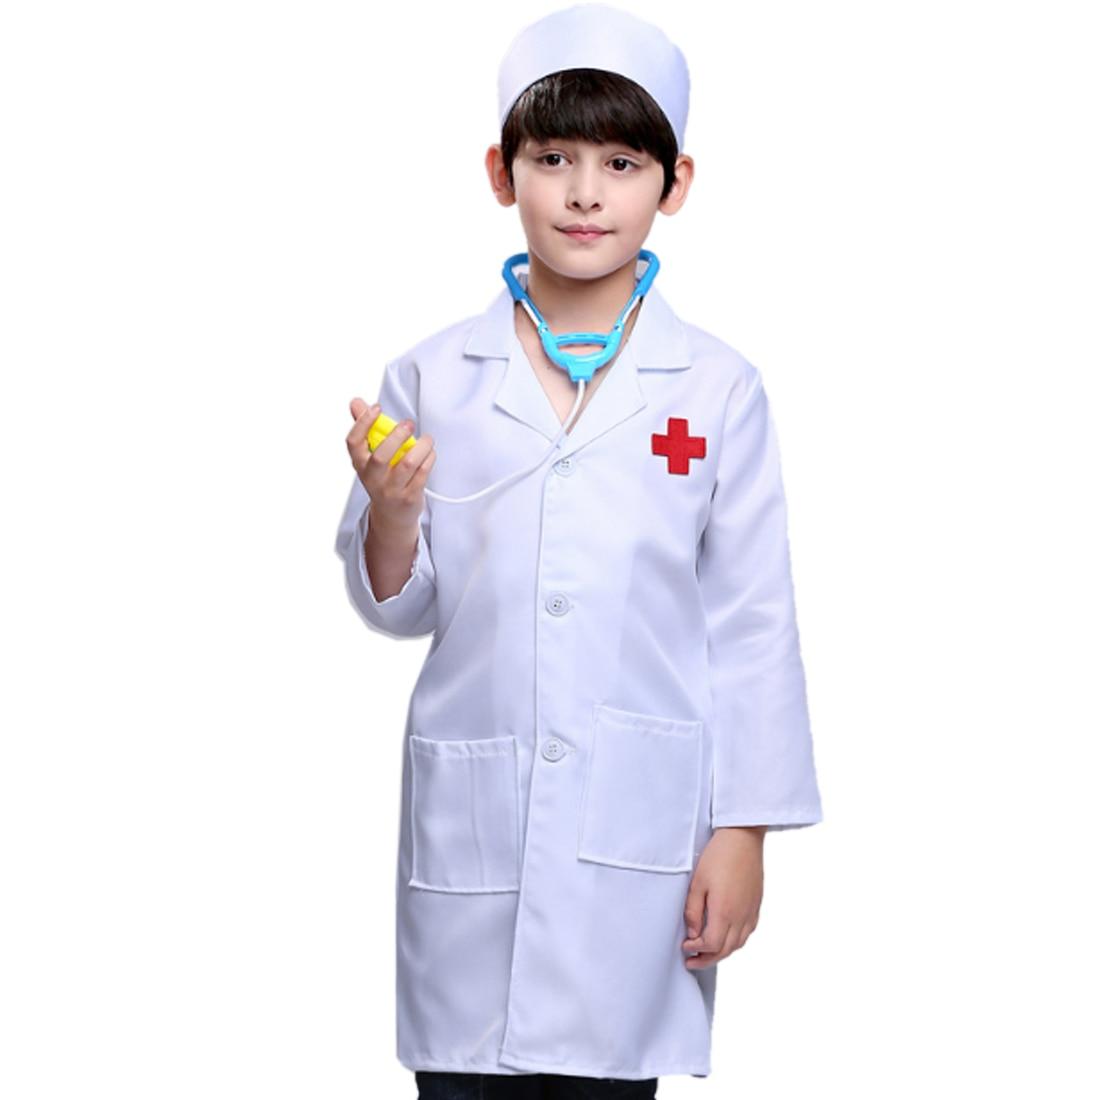 1pcs Pretend Play Little Nurse Doctor Professional Role Playing Costume For 90cm 110cm 130cm Children Boys- Doctor Sleeve + Cap